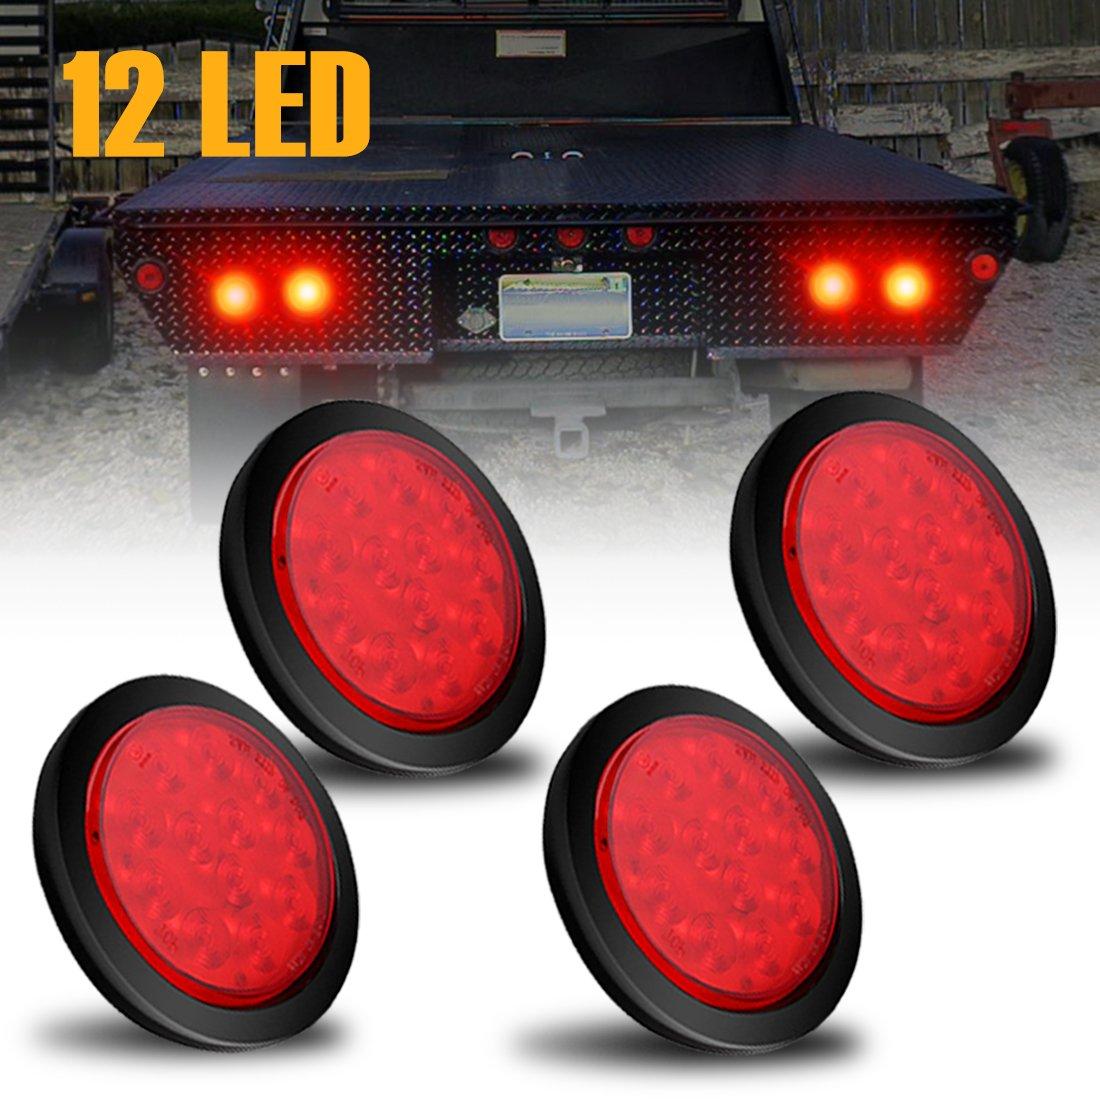 AMBOTHER 4'' Round 12-LED Truck Trailer Brake Stop Turn Marker Tail Light Flush Mount Back-Up Low Profile Light, Waterproof Tight Sealed Grommet Plug for RV Boat Truck Trailer Red DC 12V (Pack of 4)